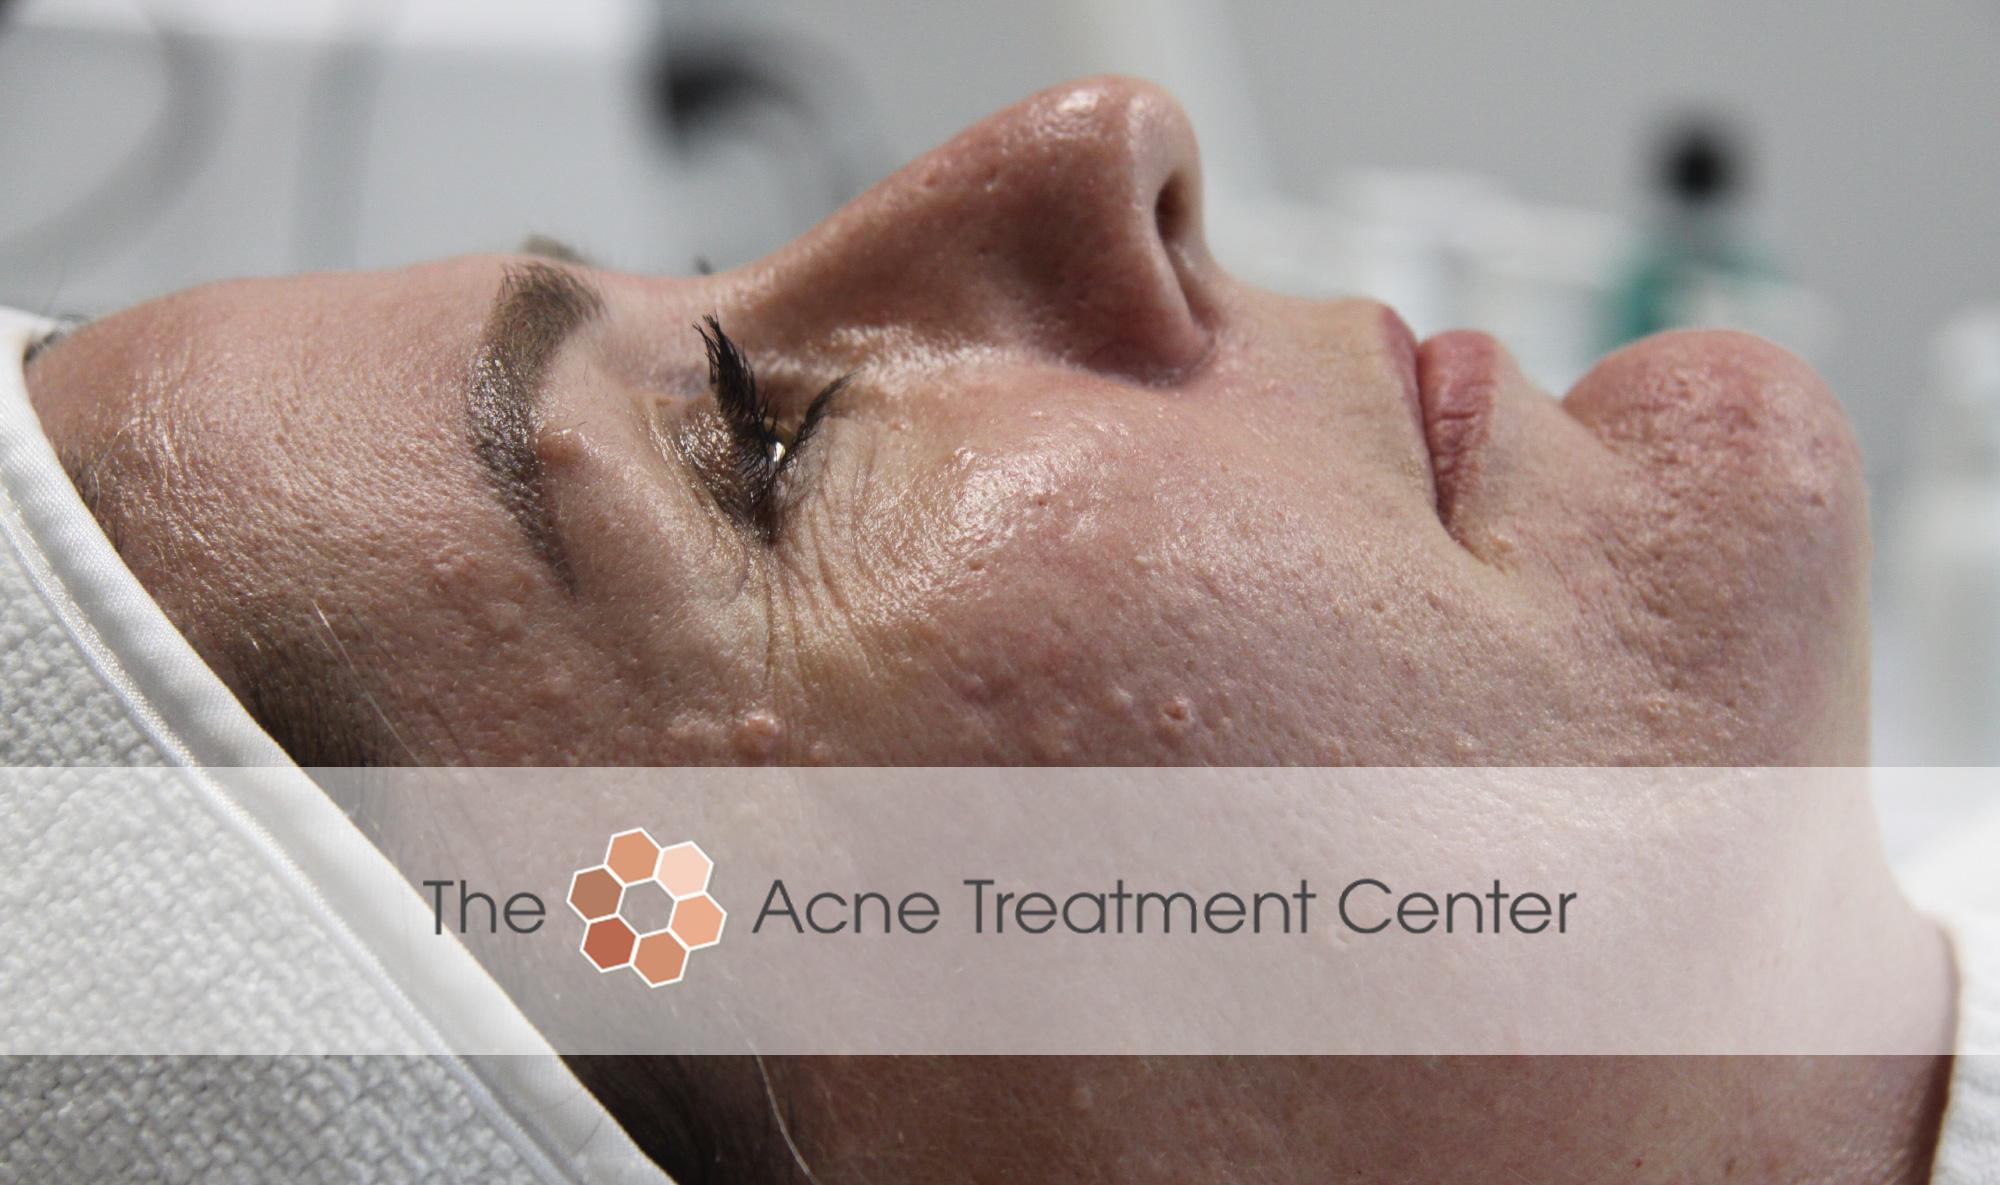 Acne Treatment Center in Portland Oregon Treats Sebaceous Hyperplasia